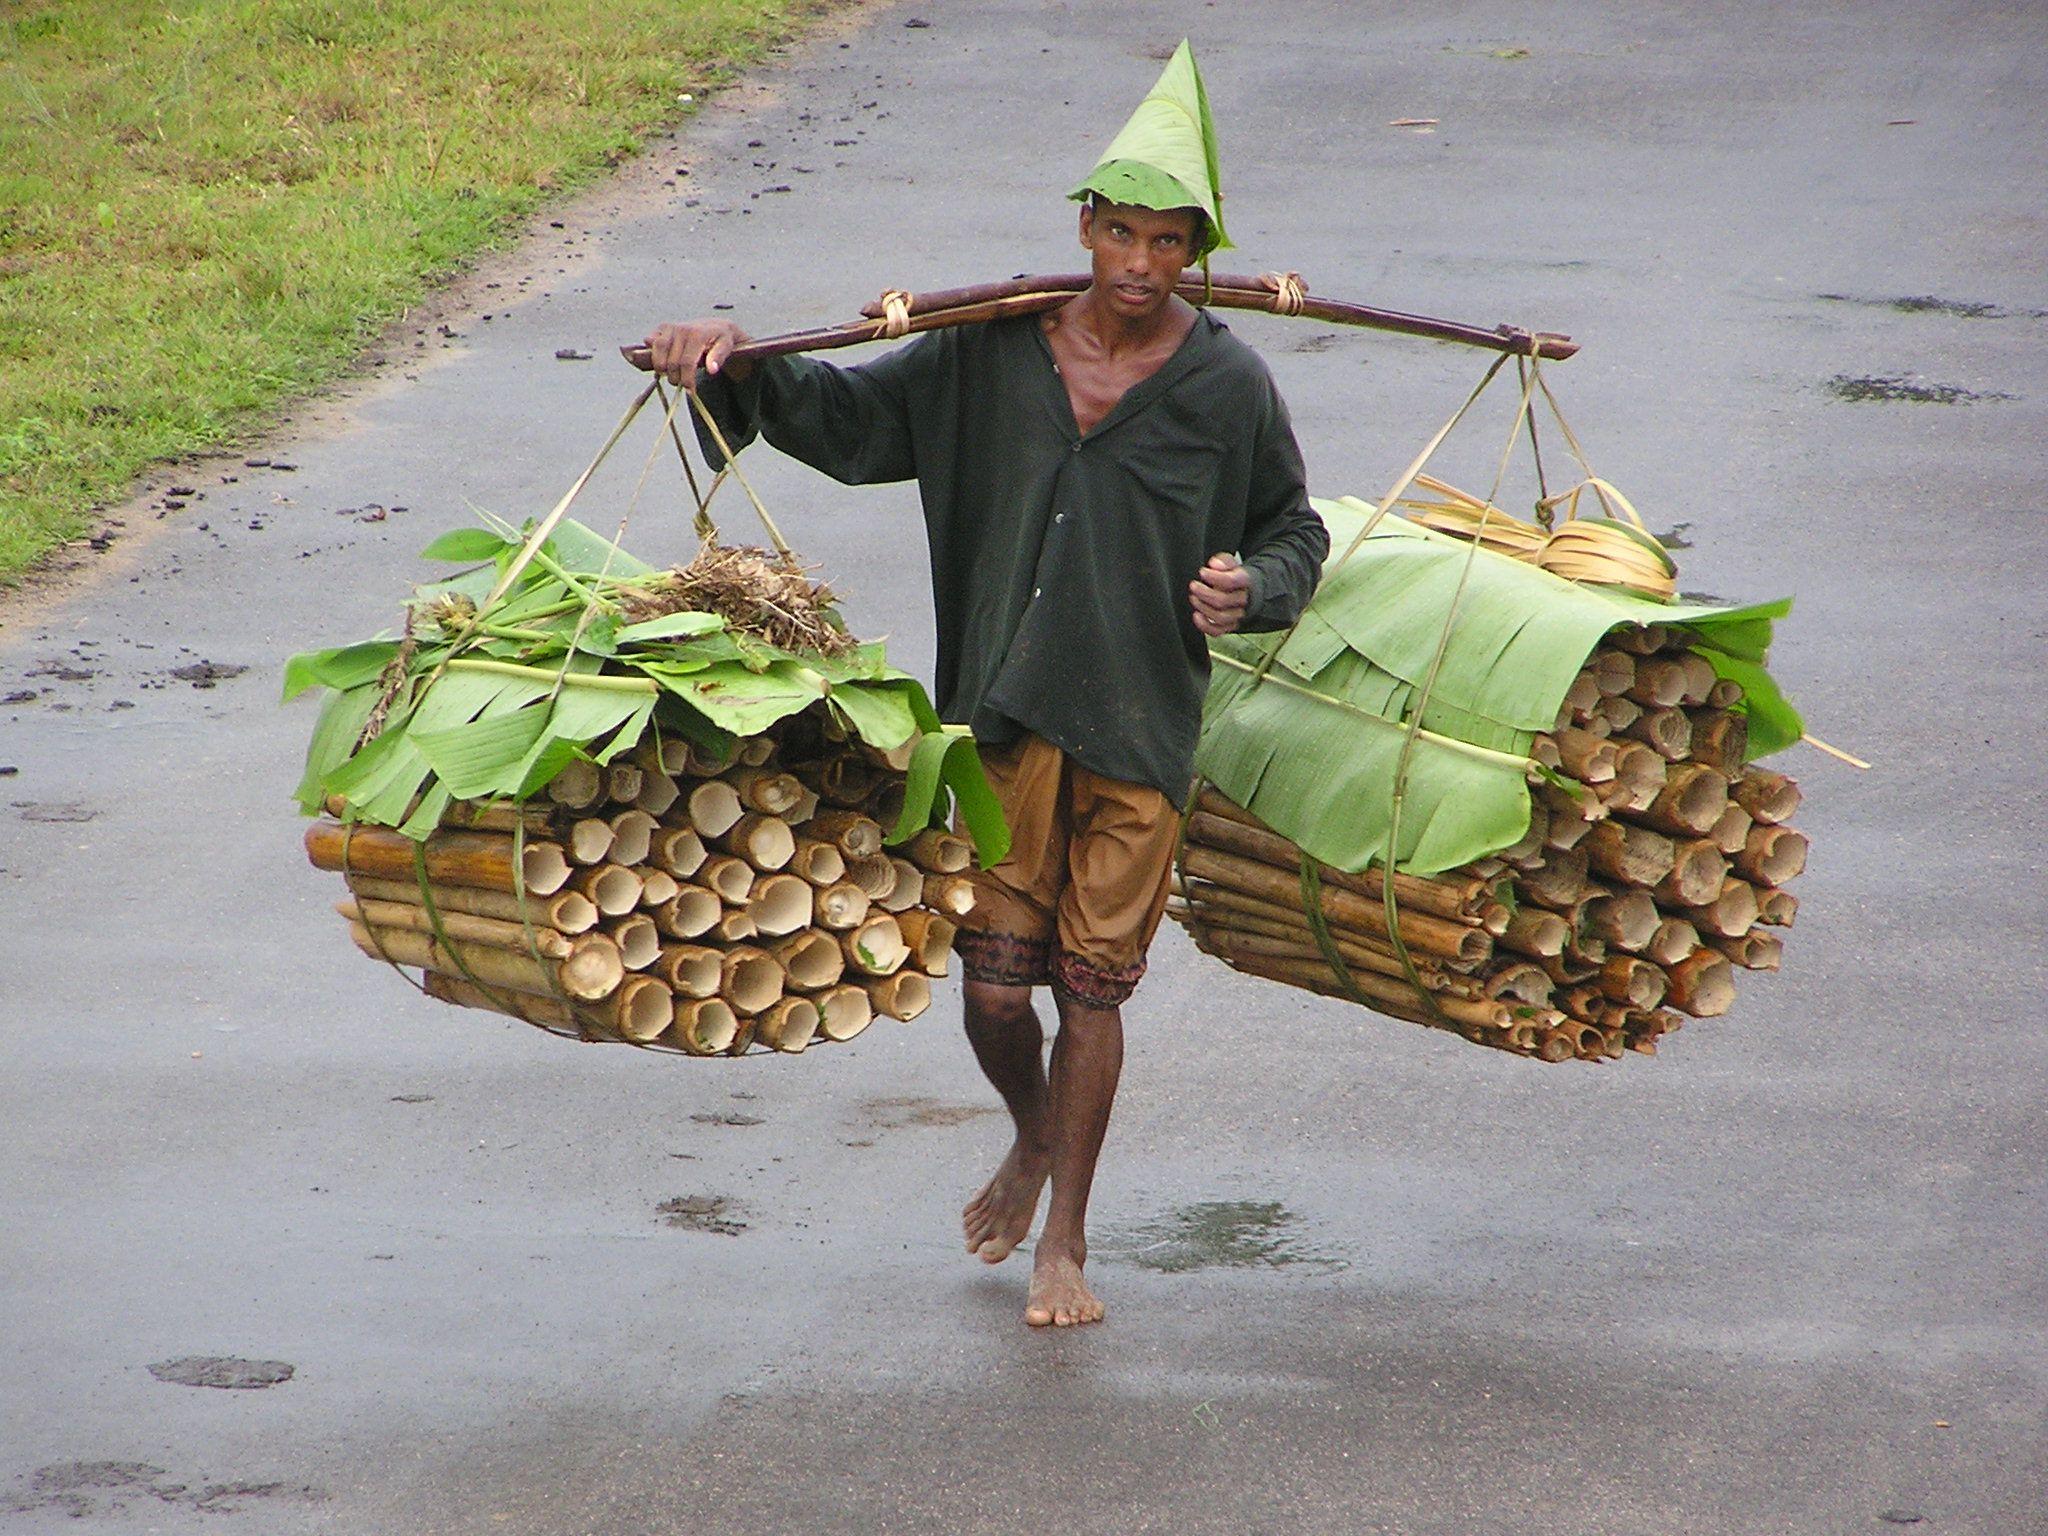 Bangladeshi bamboo forest worker  Photo by Melanie Pratt